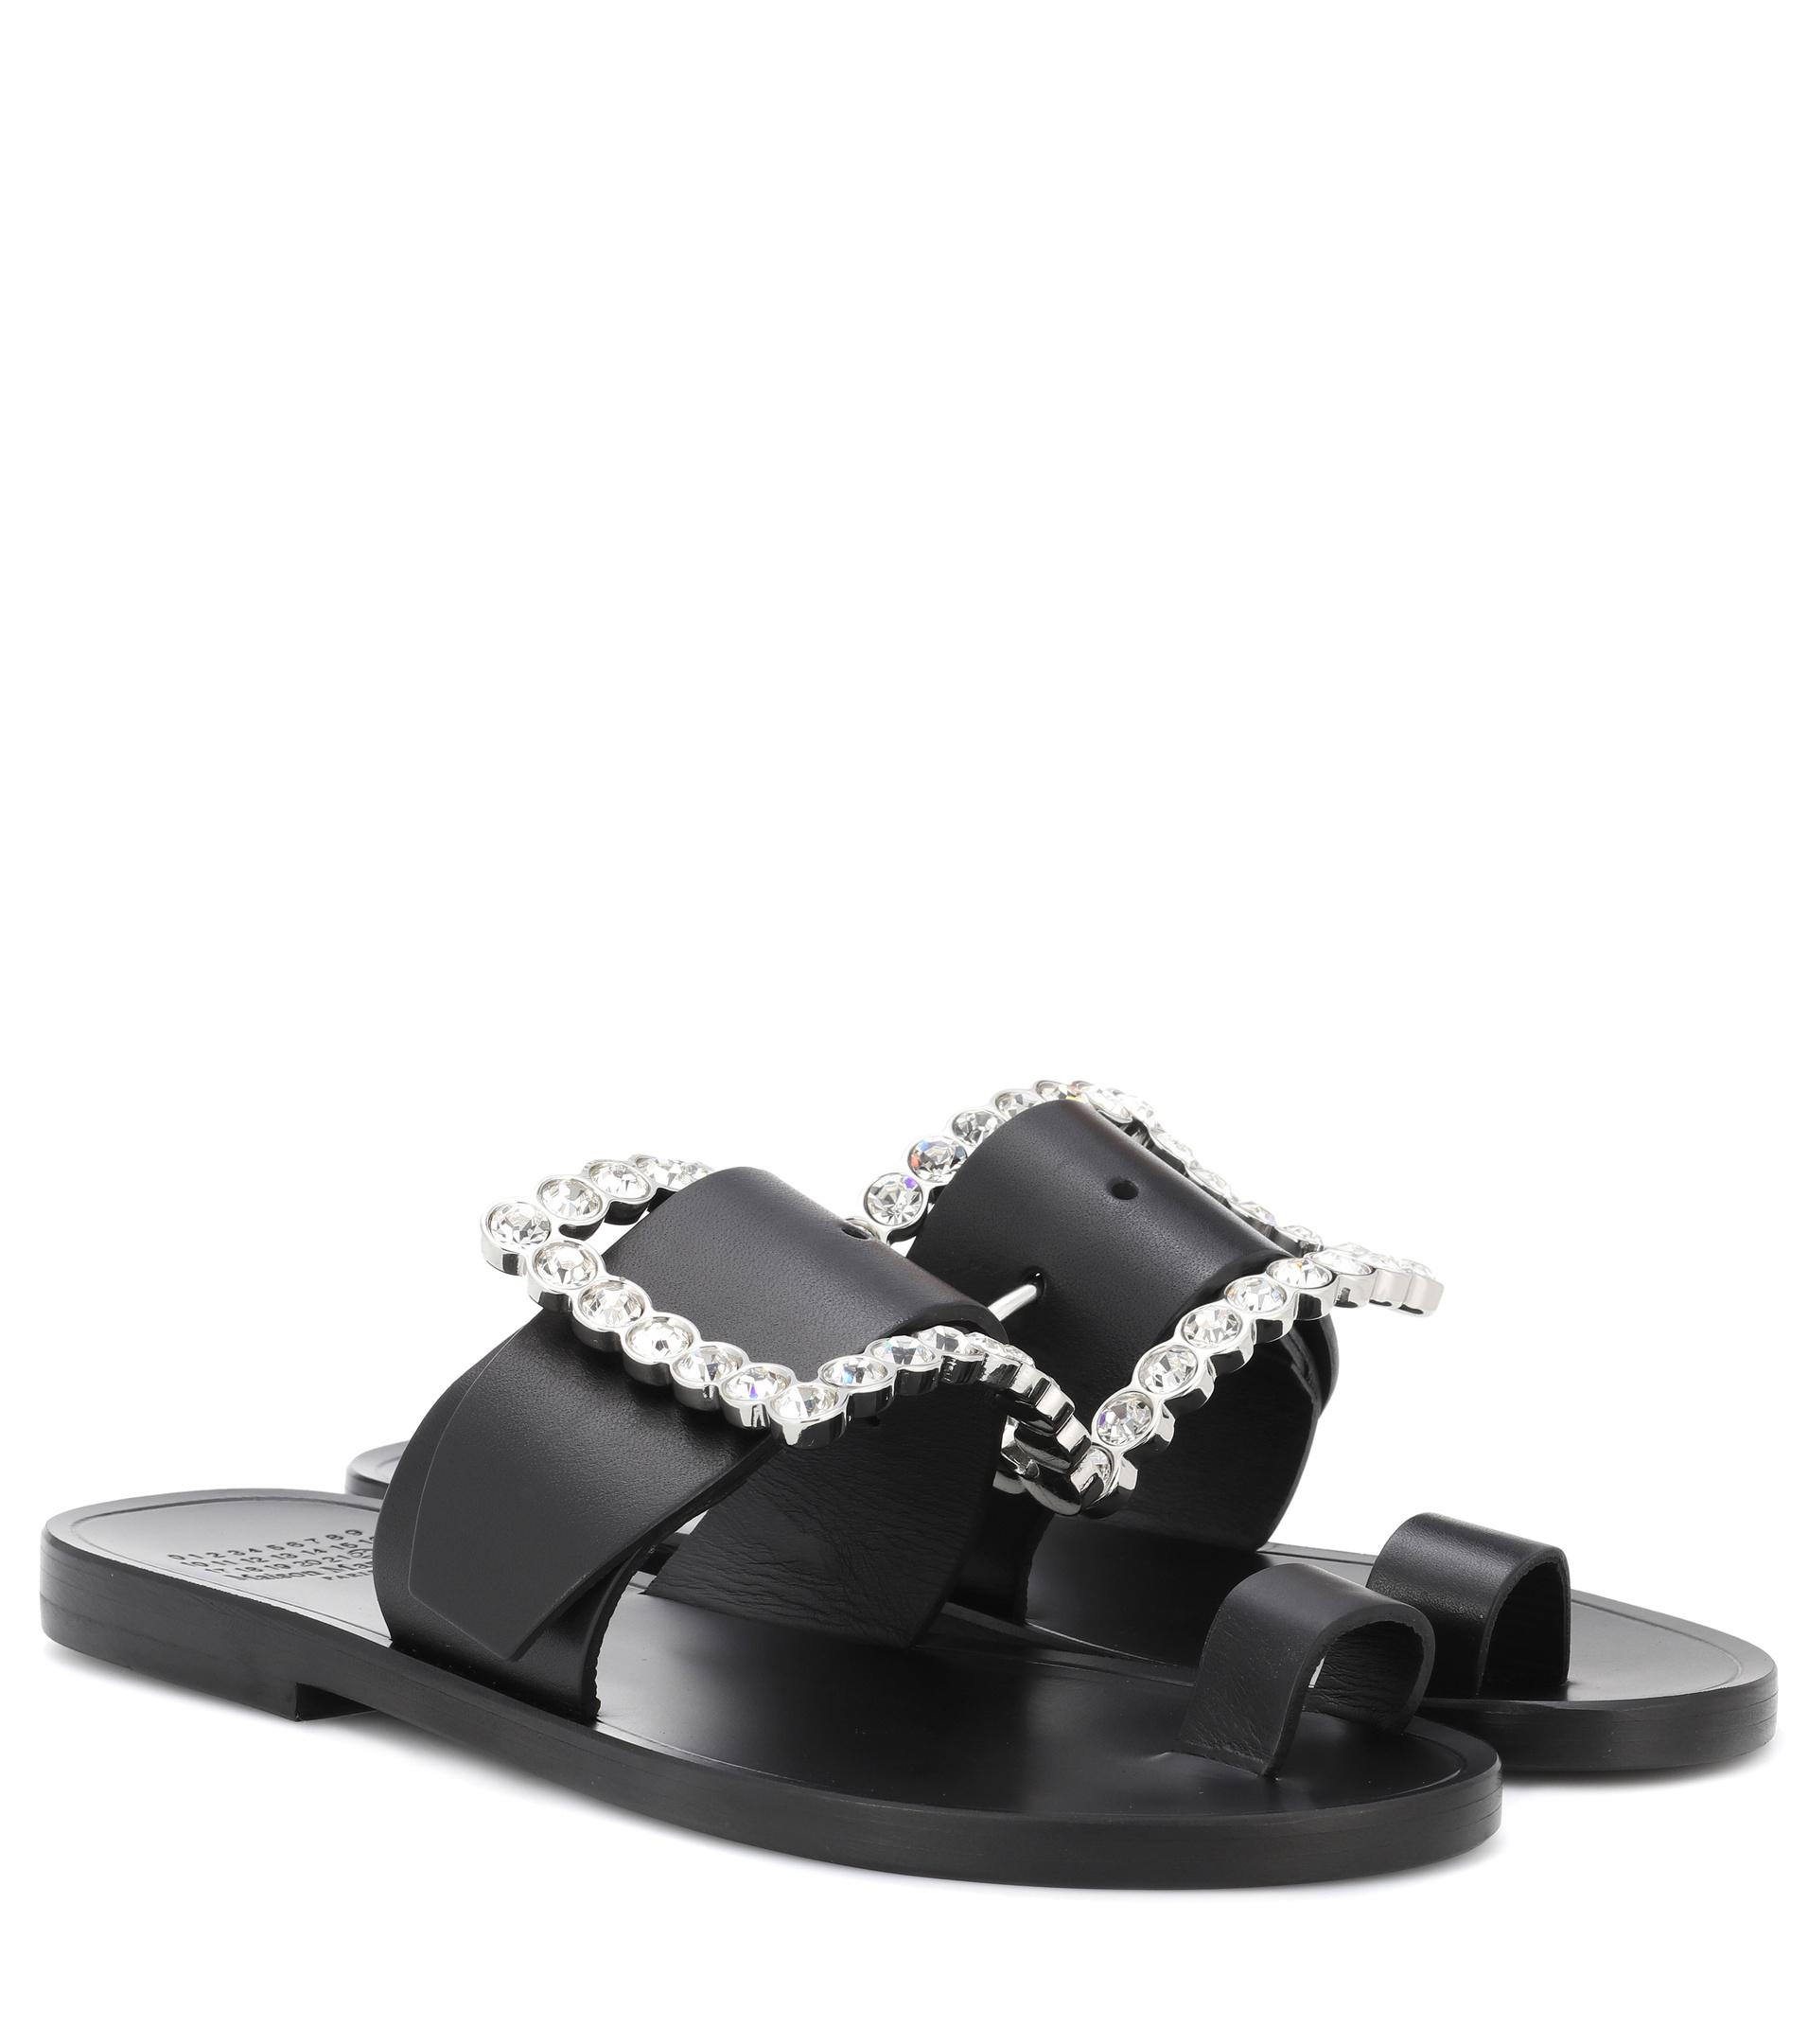 crystal buckle sandals - Black Maison Martin Margiela NV2U7iEYJo